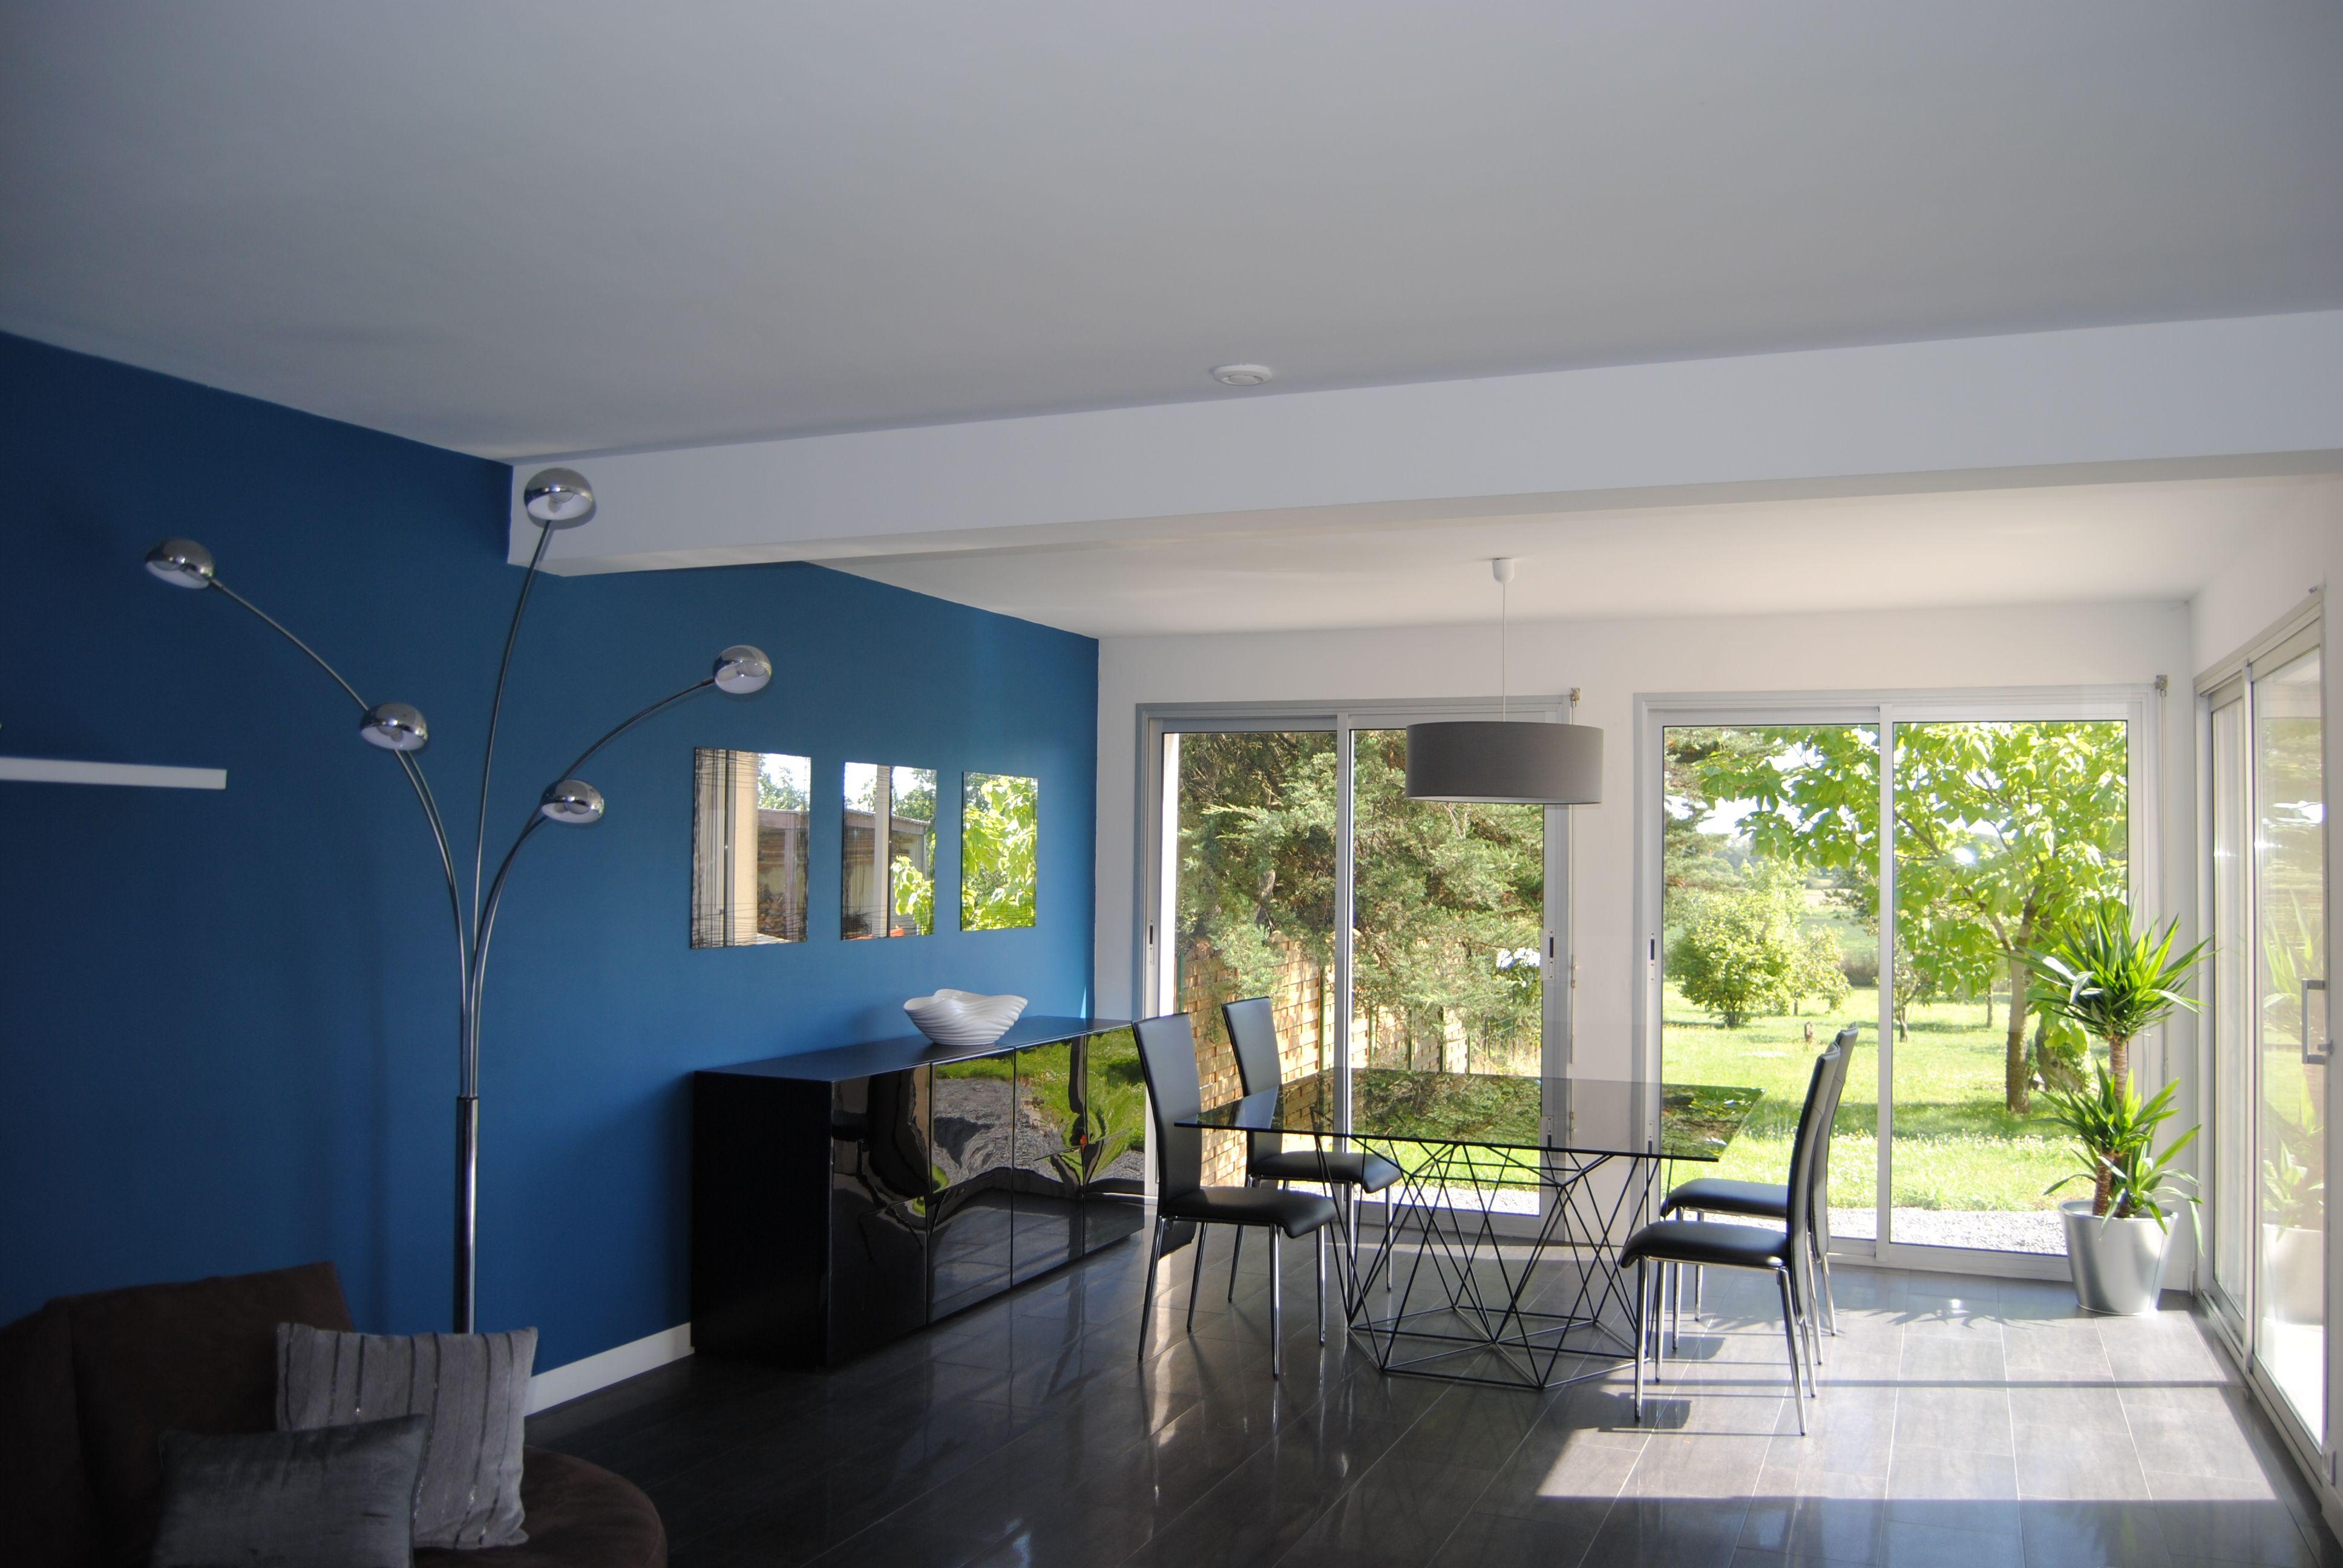 mobile partie salle manger 3872 2592 pi ce vivre pinterest vivre et pi ces de. Black Bedroom Furniture Sets. Home Design Ideas